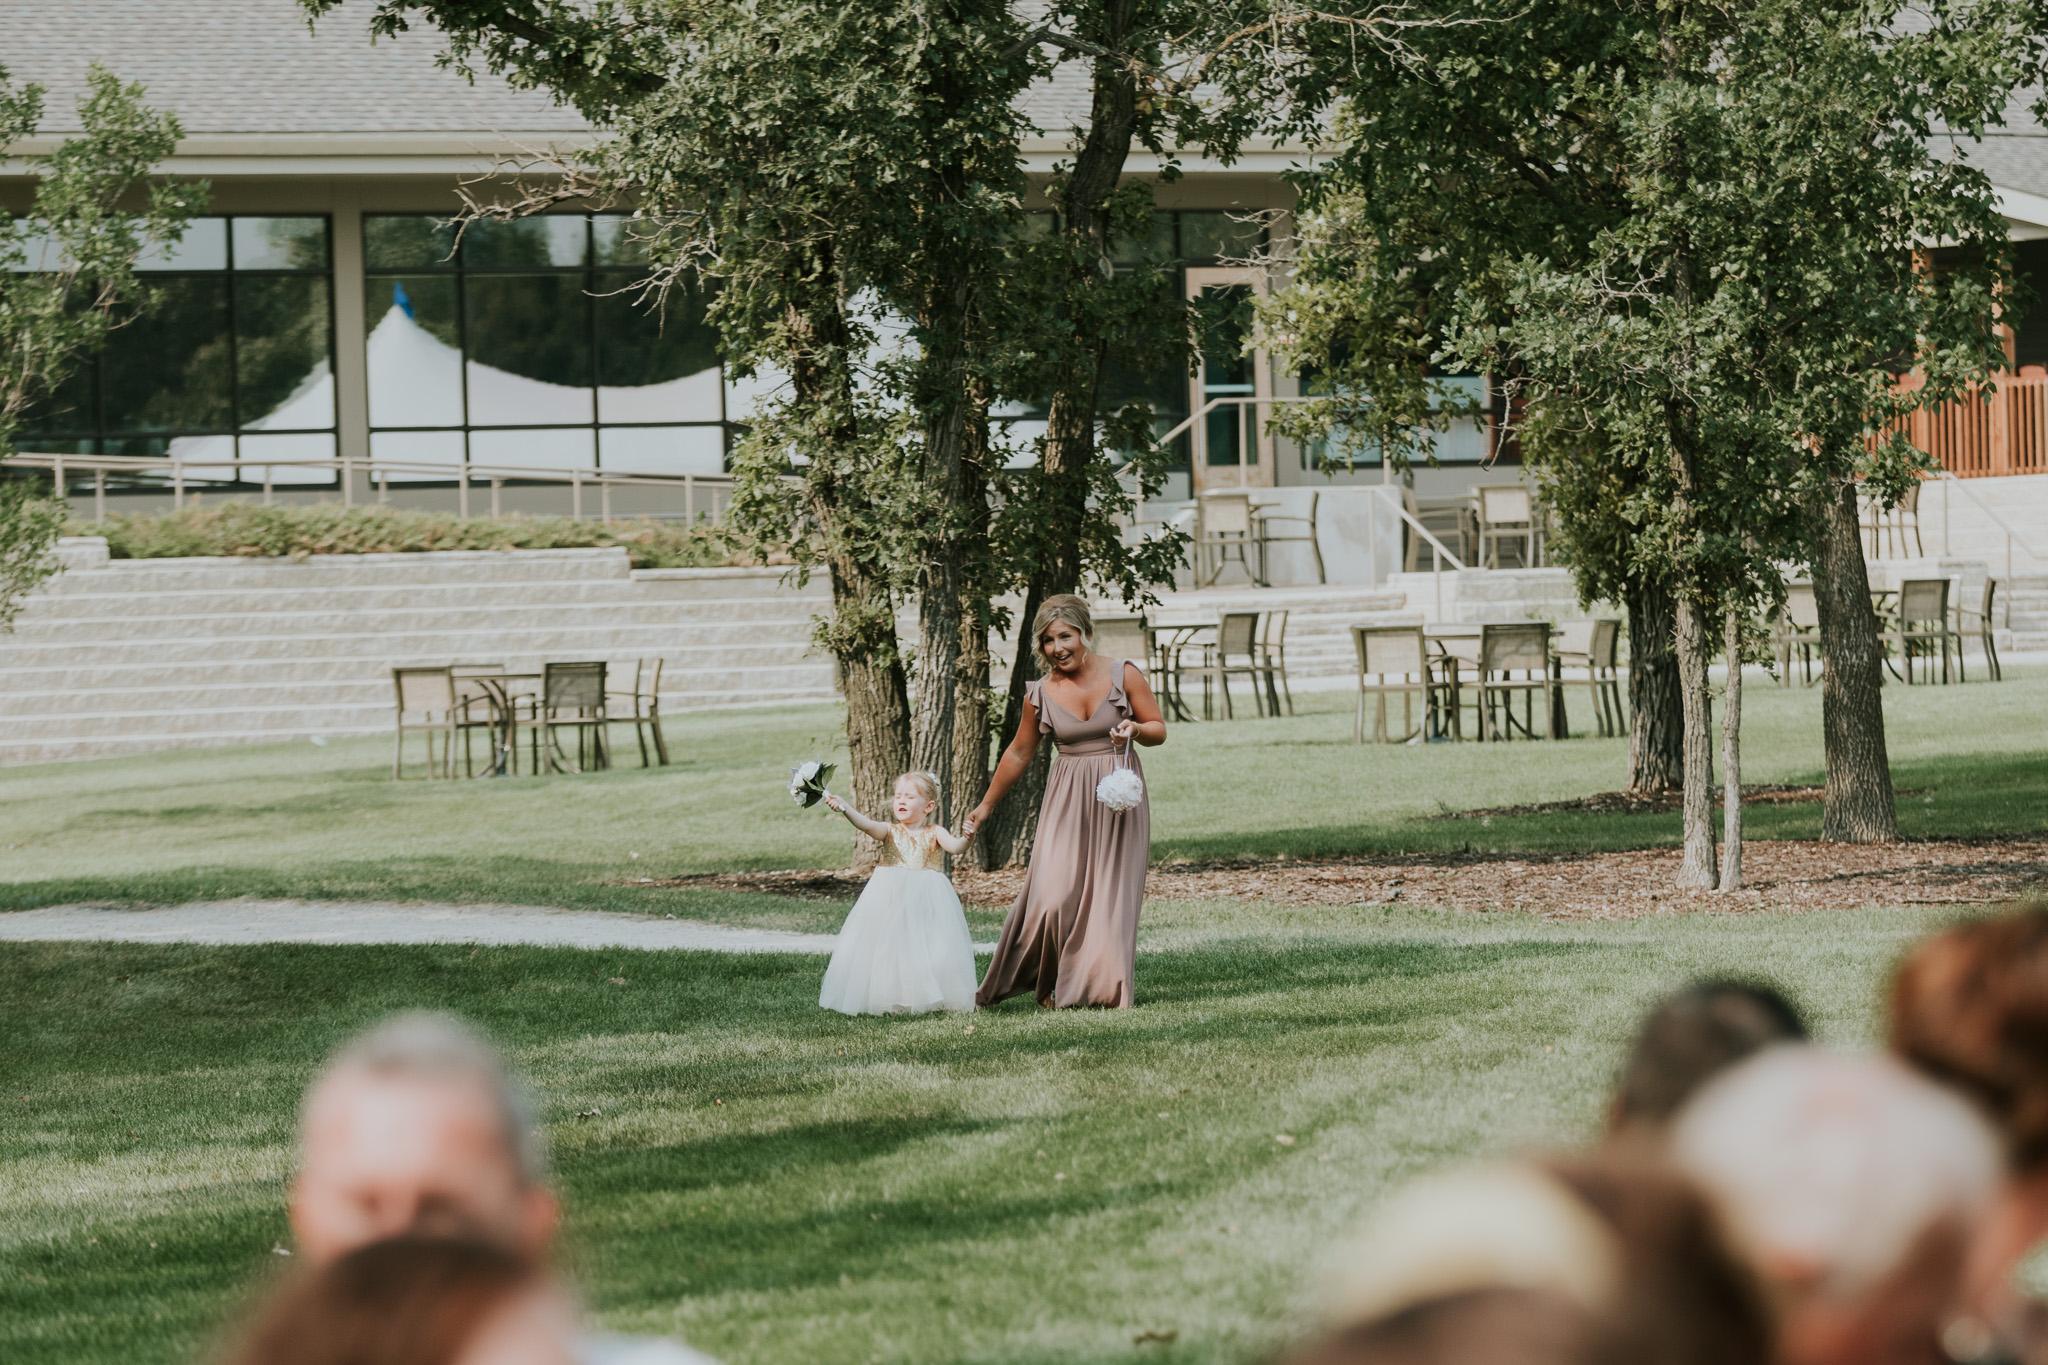 southwood-golf-course-wedding-winnipeg-45.jpg